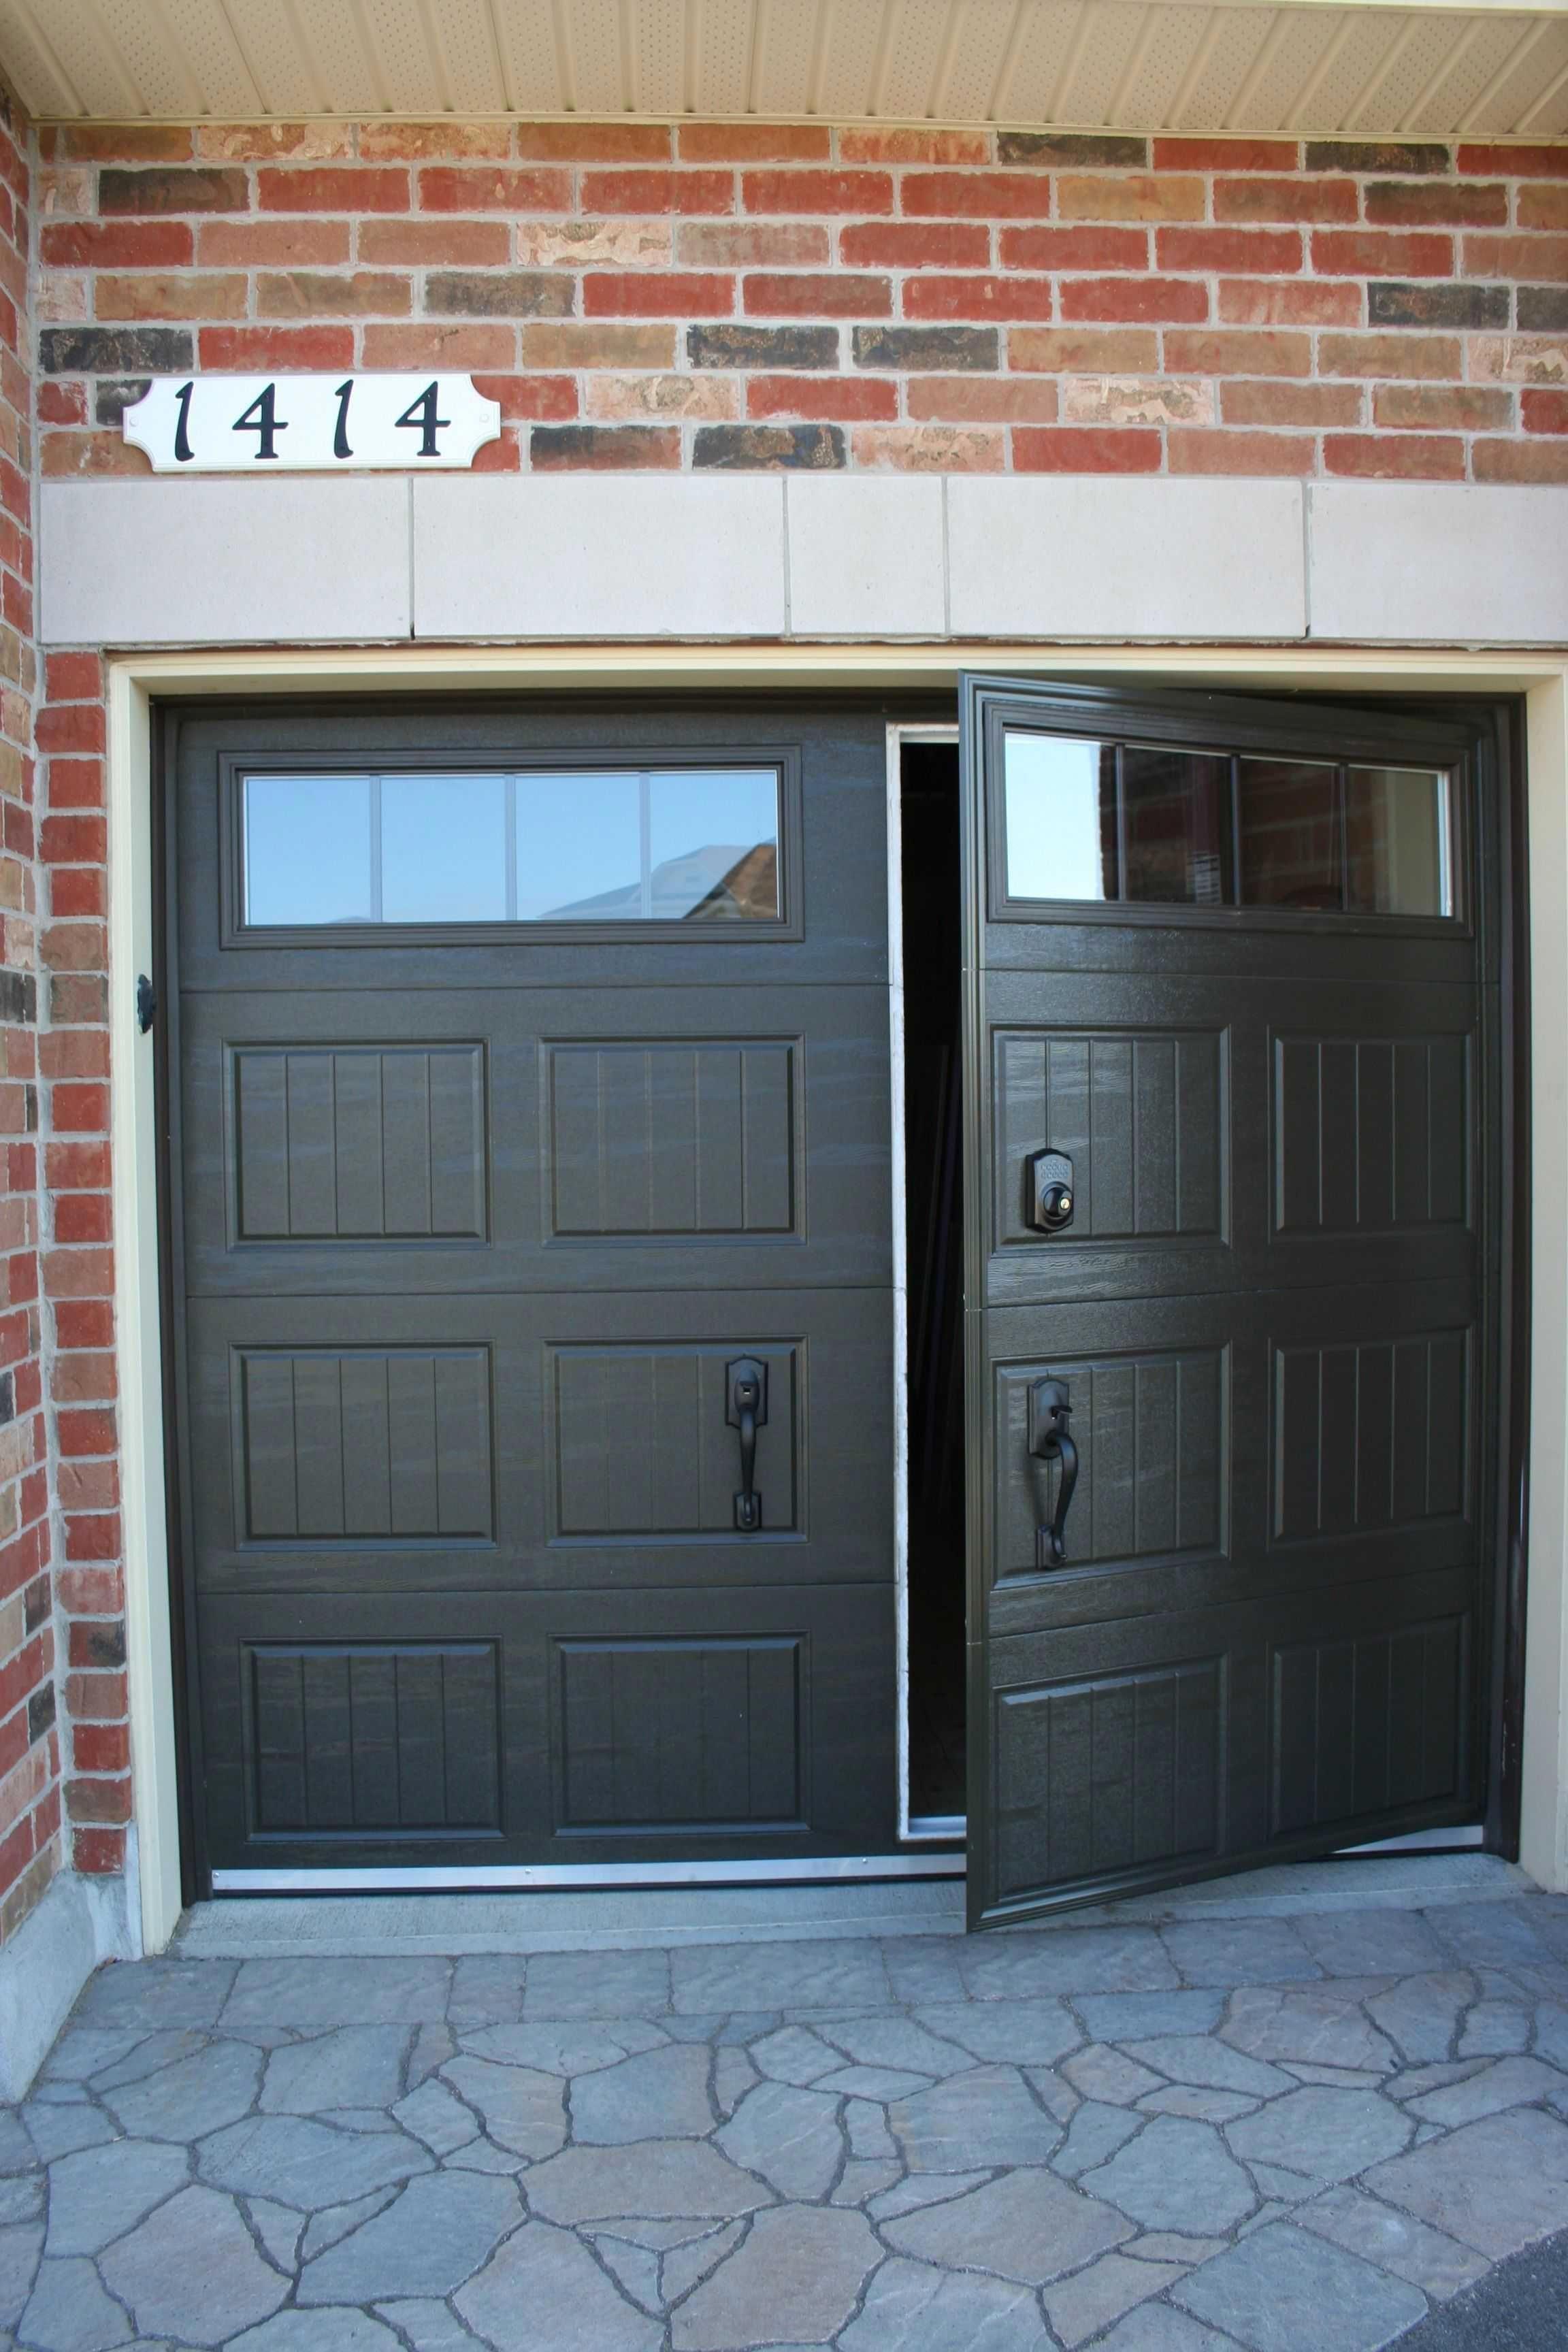 Black Garage Doors With Long Windows Garage Doors Garage Door Colors Garage Door Design